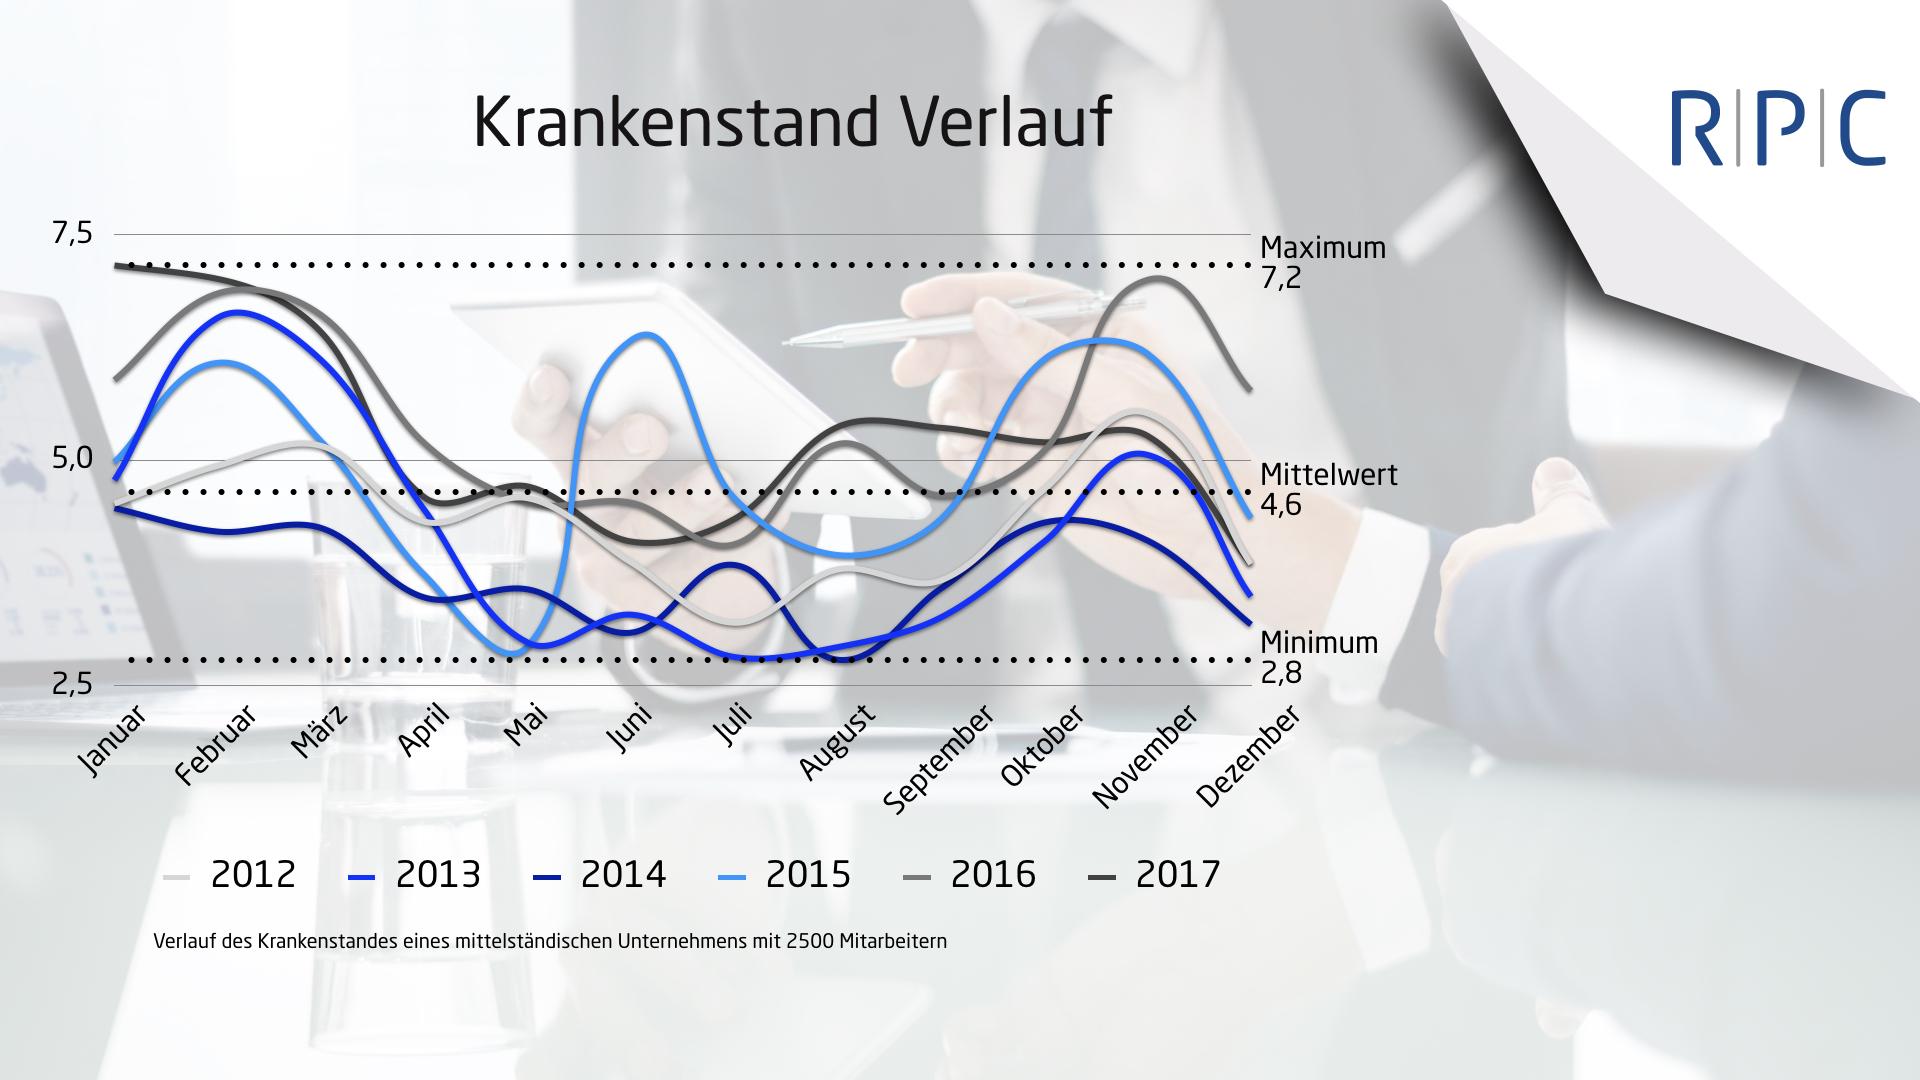 RPC Consulting GmbH Krankenstand Verlauf